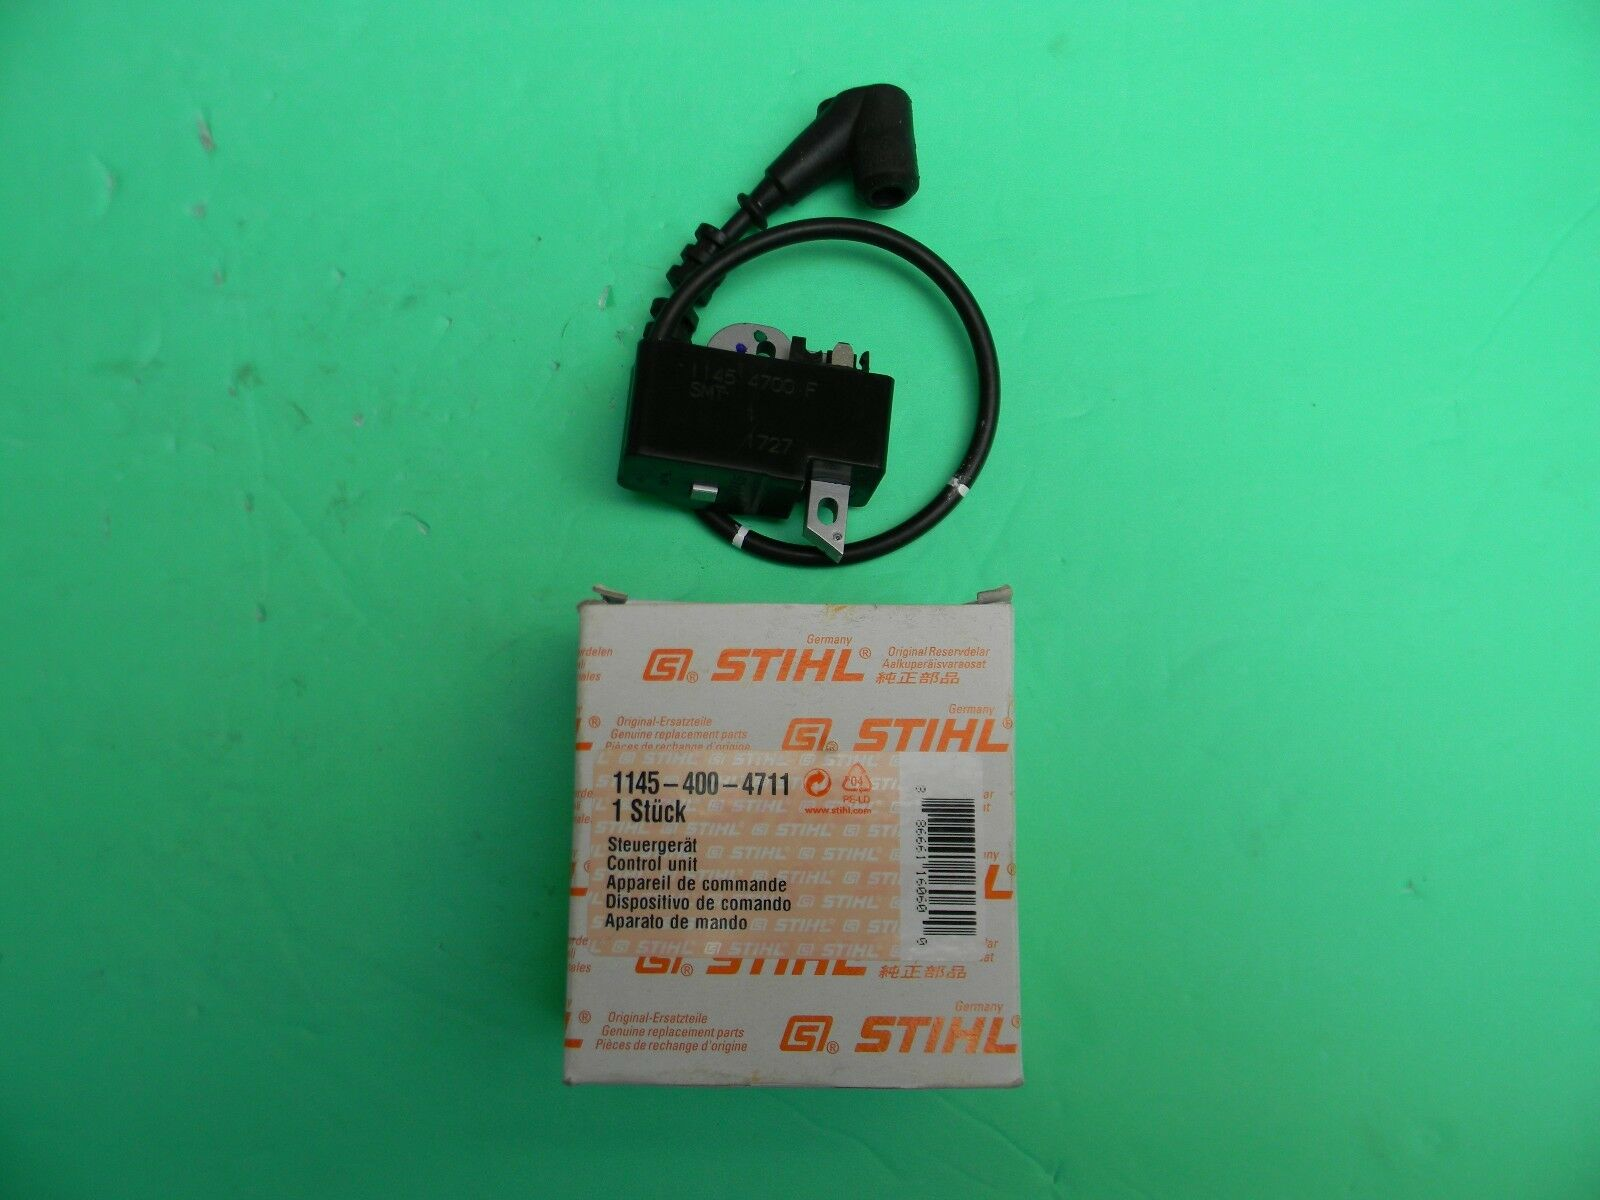 Nuevo Original Equipment Manufacturer Stihl MS201 MS201 C 201 Bobina 201TC Unidad De Control   T 1145 400 4711 -- DR37